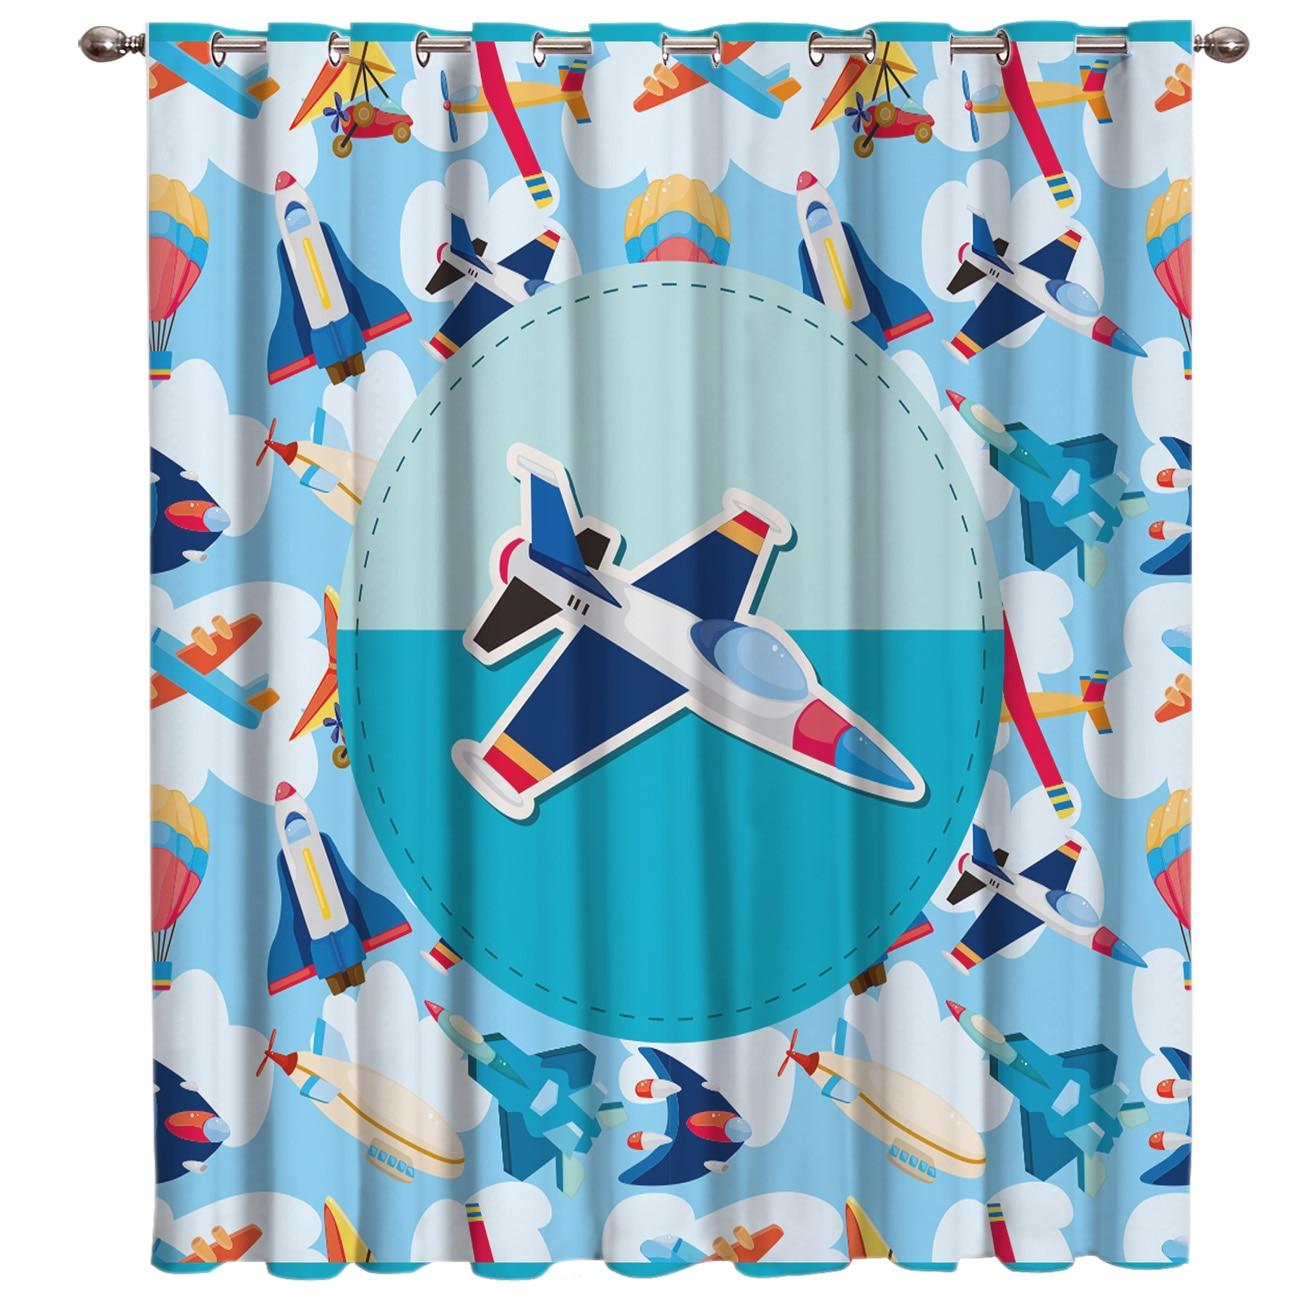 Cartoon Airplane Pattern Window Treatments Curtains Valance Bathroom Kitchen Fabric Indoor Decor Window Treatment Sets Curtains